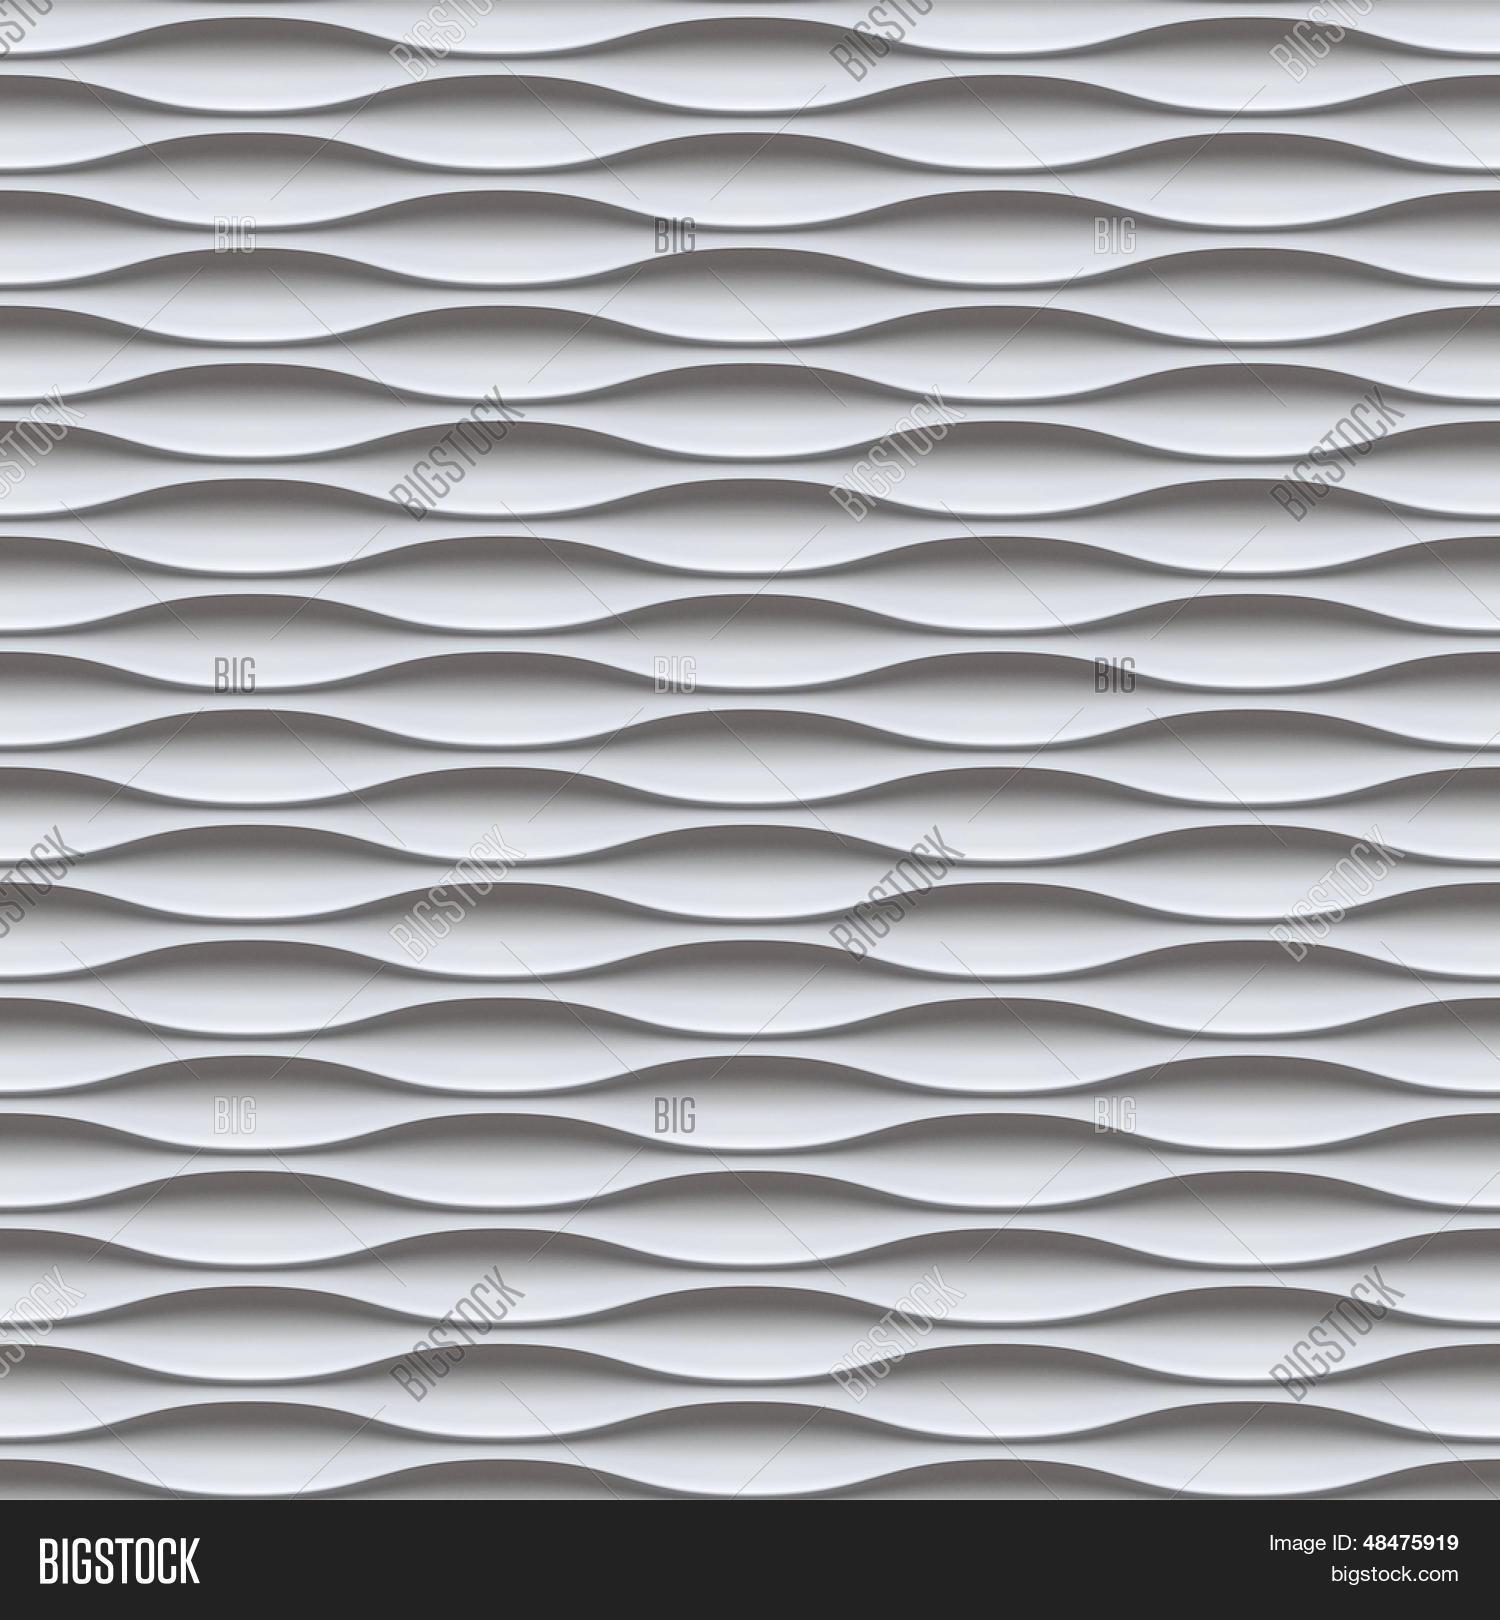 Black Seamless Texture Image Photo Free Trial Bigstock